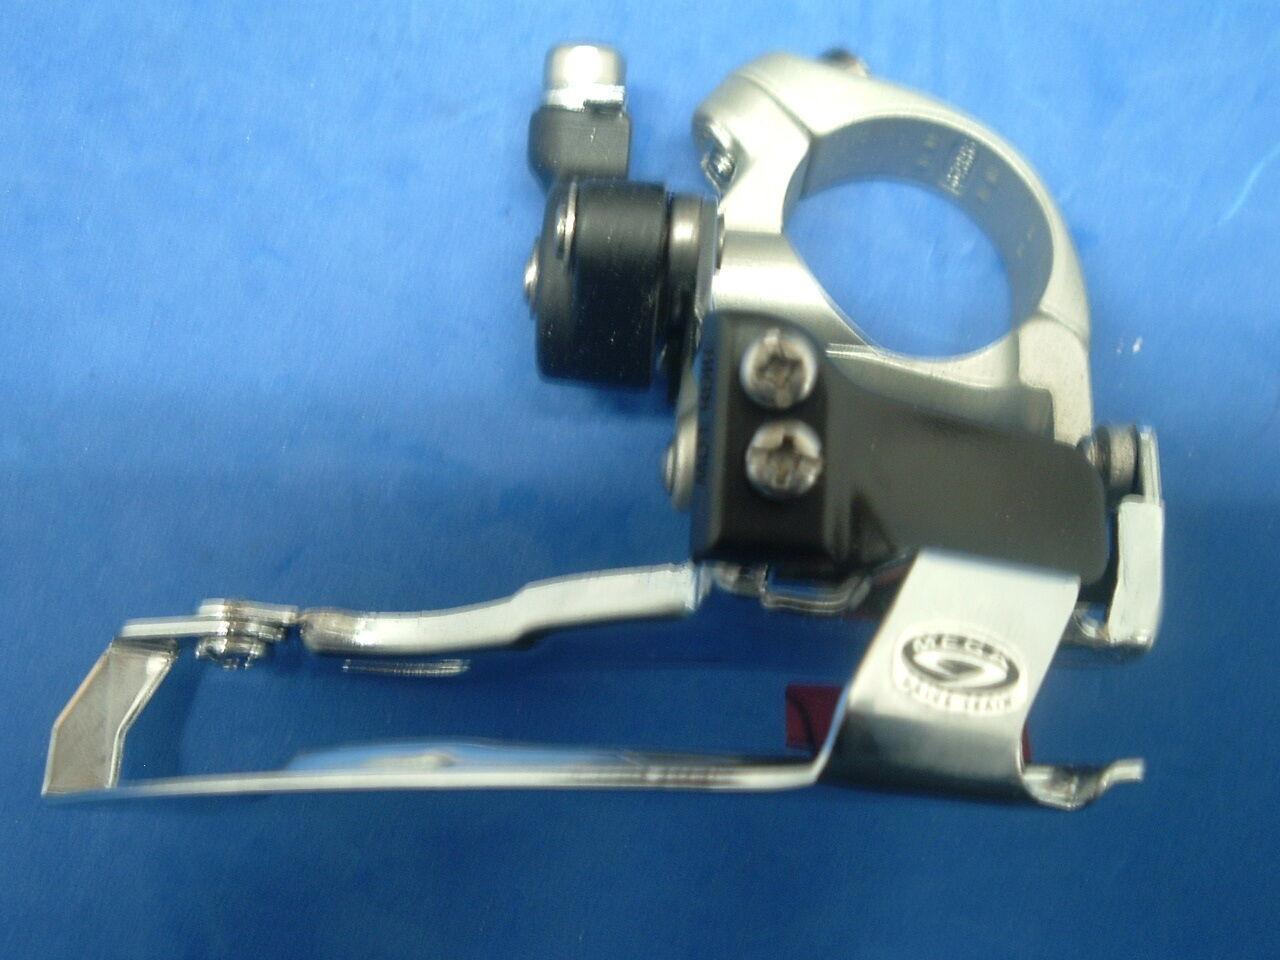 Shimano Deore XT M750 MTB Front Umwerfer Neu / Nummern Vintage 28.6MM 8/9 TP/TS